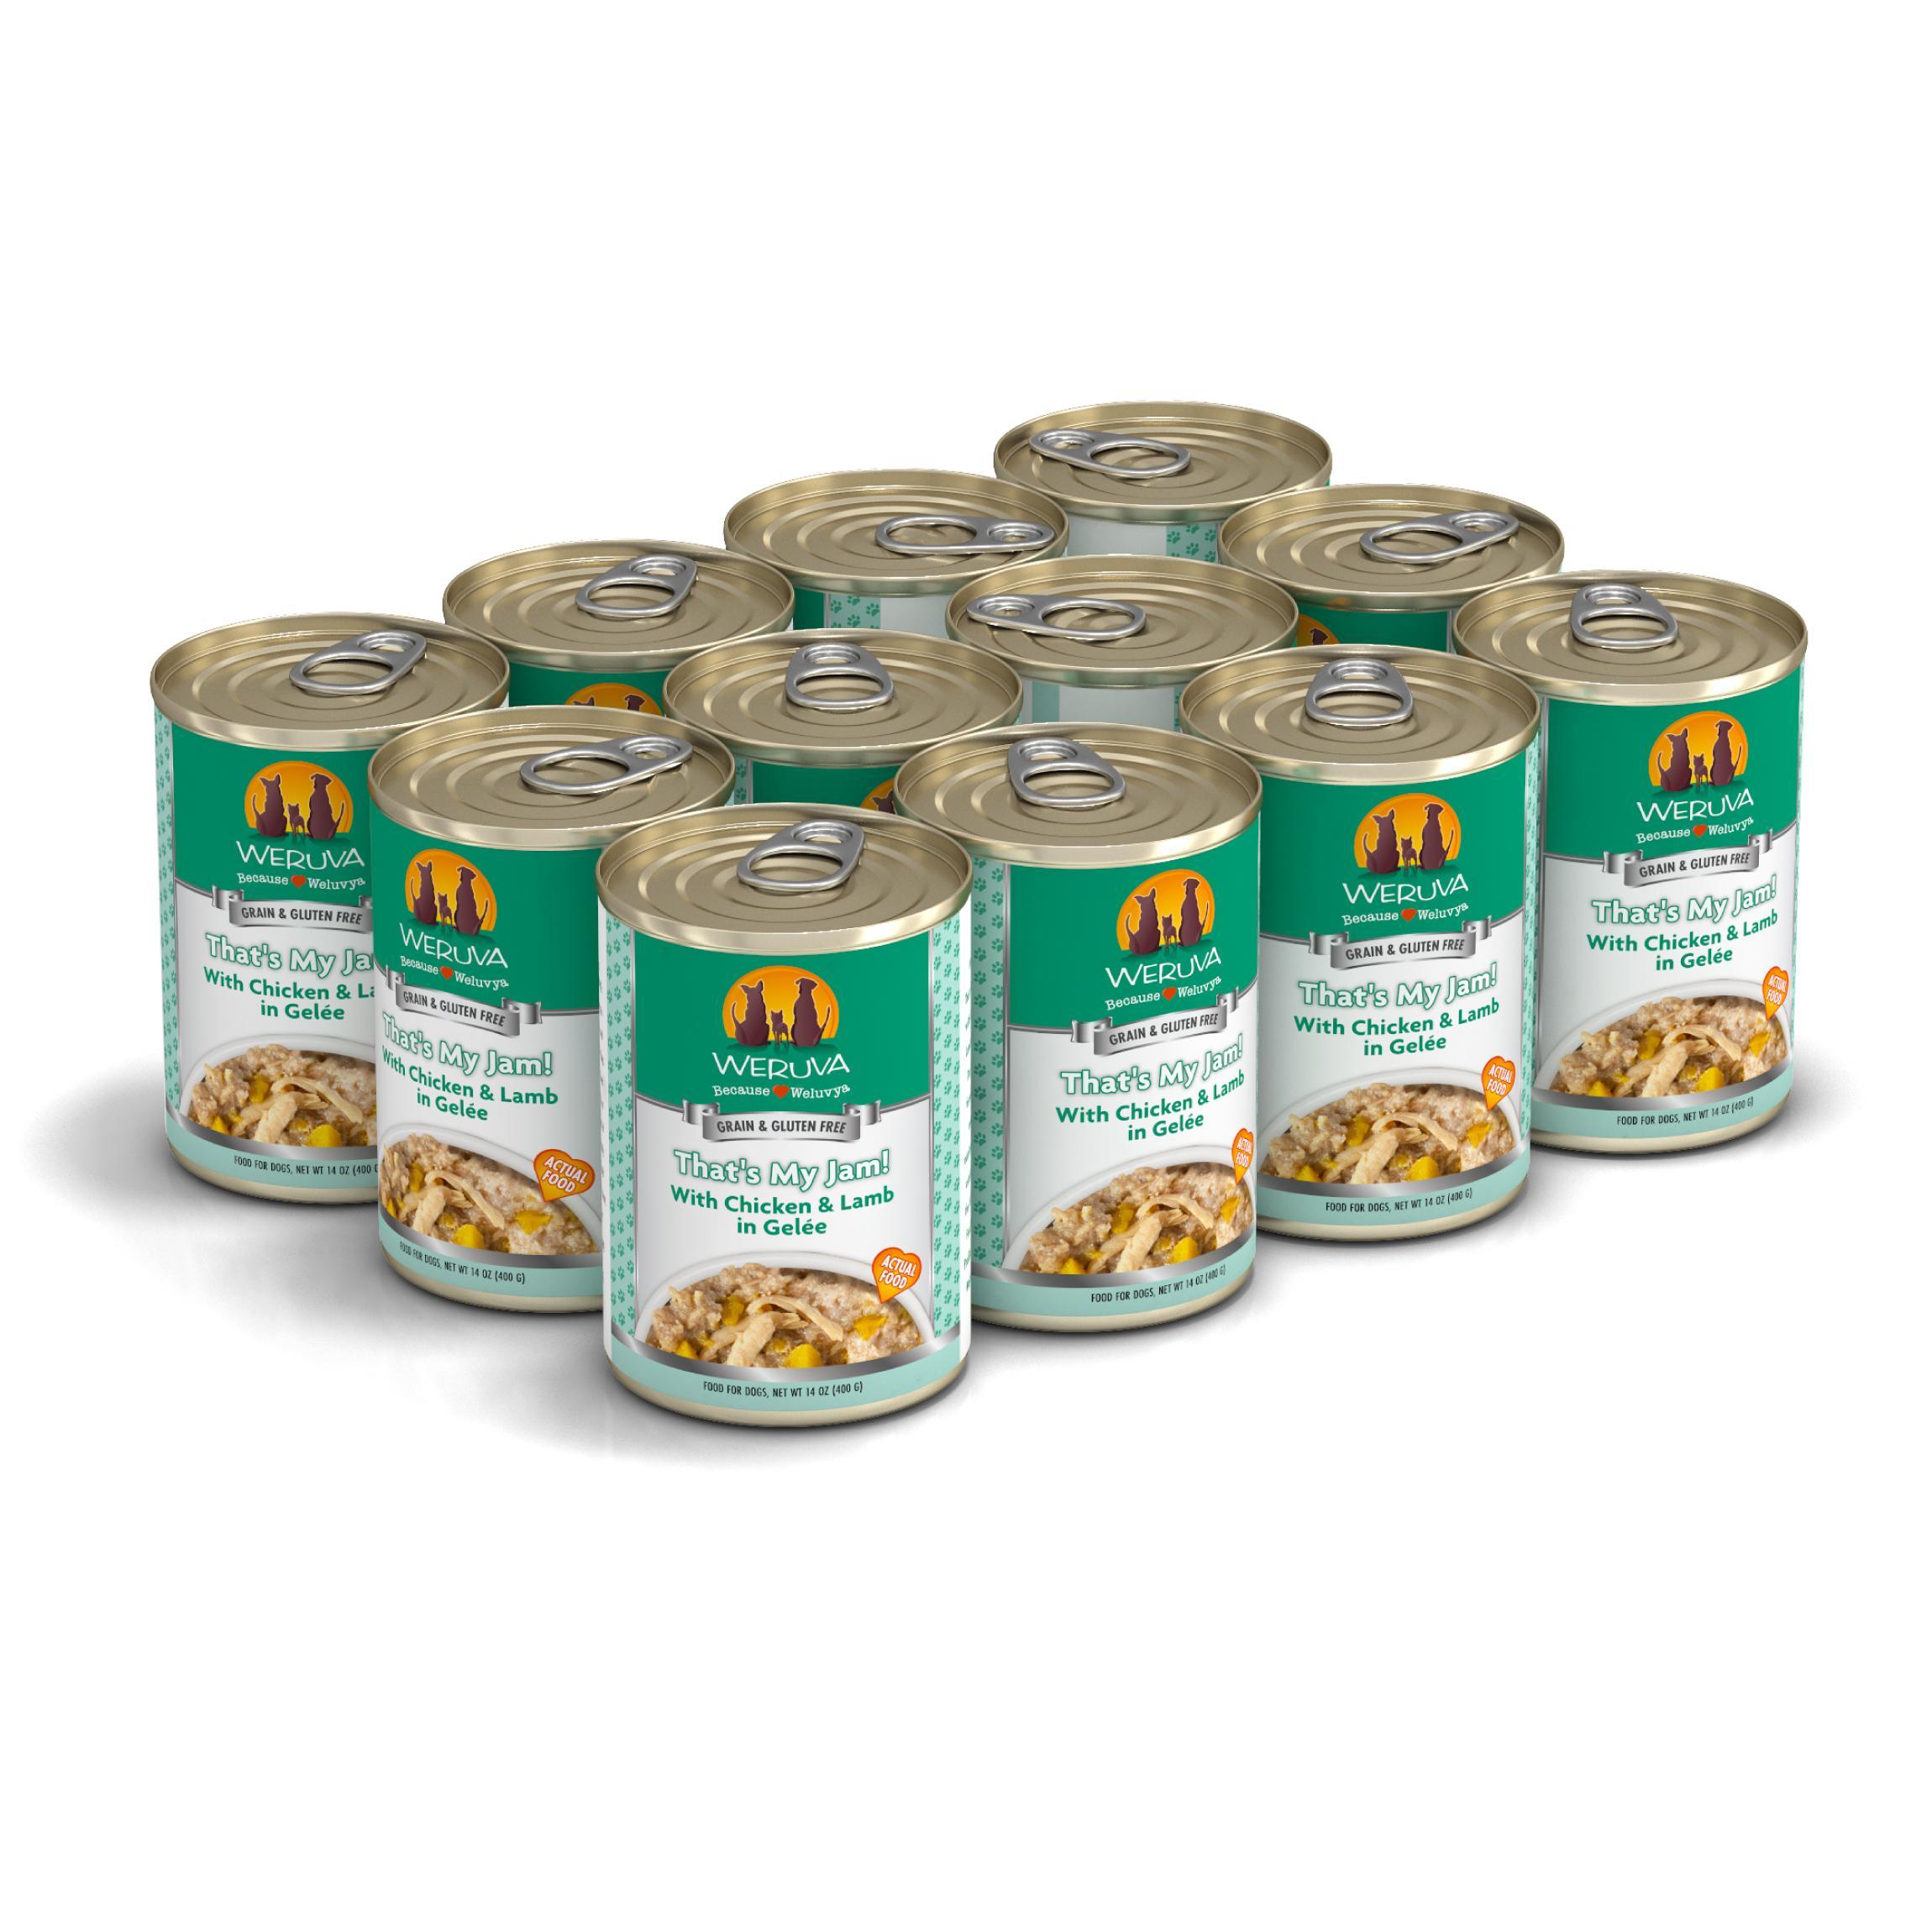 Weruva Dog Classic That's My Jam! With Chicken & Lamb in Gelee Grain-Free Wet Dog Food, 14-oz, case of 12